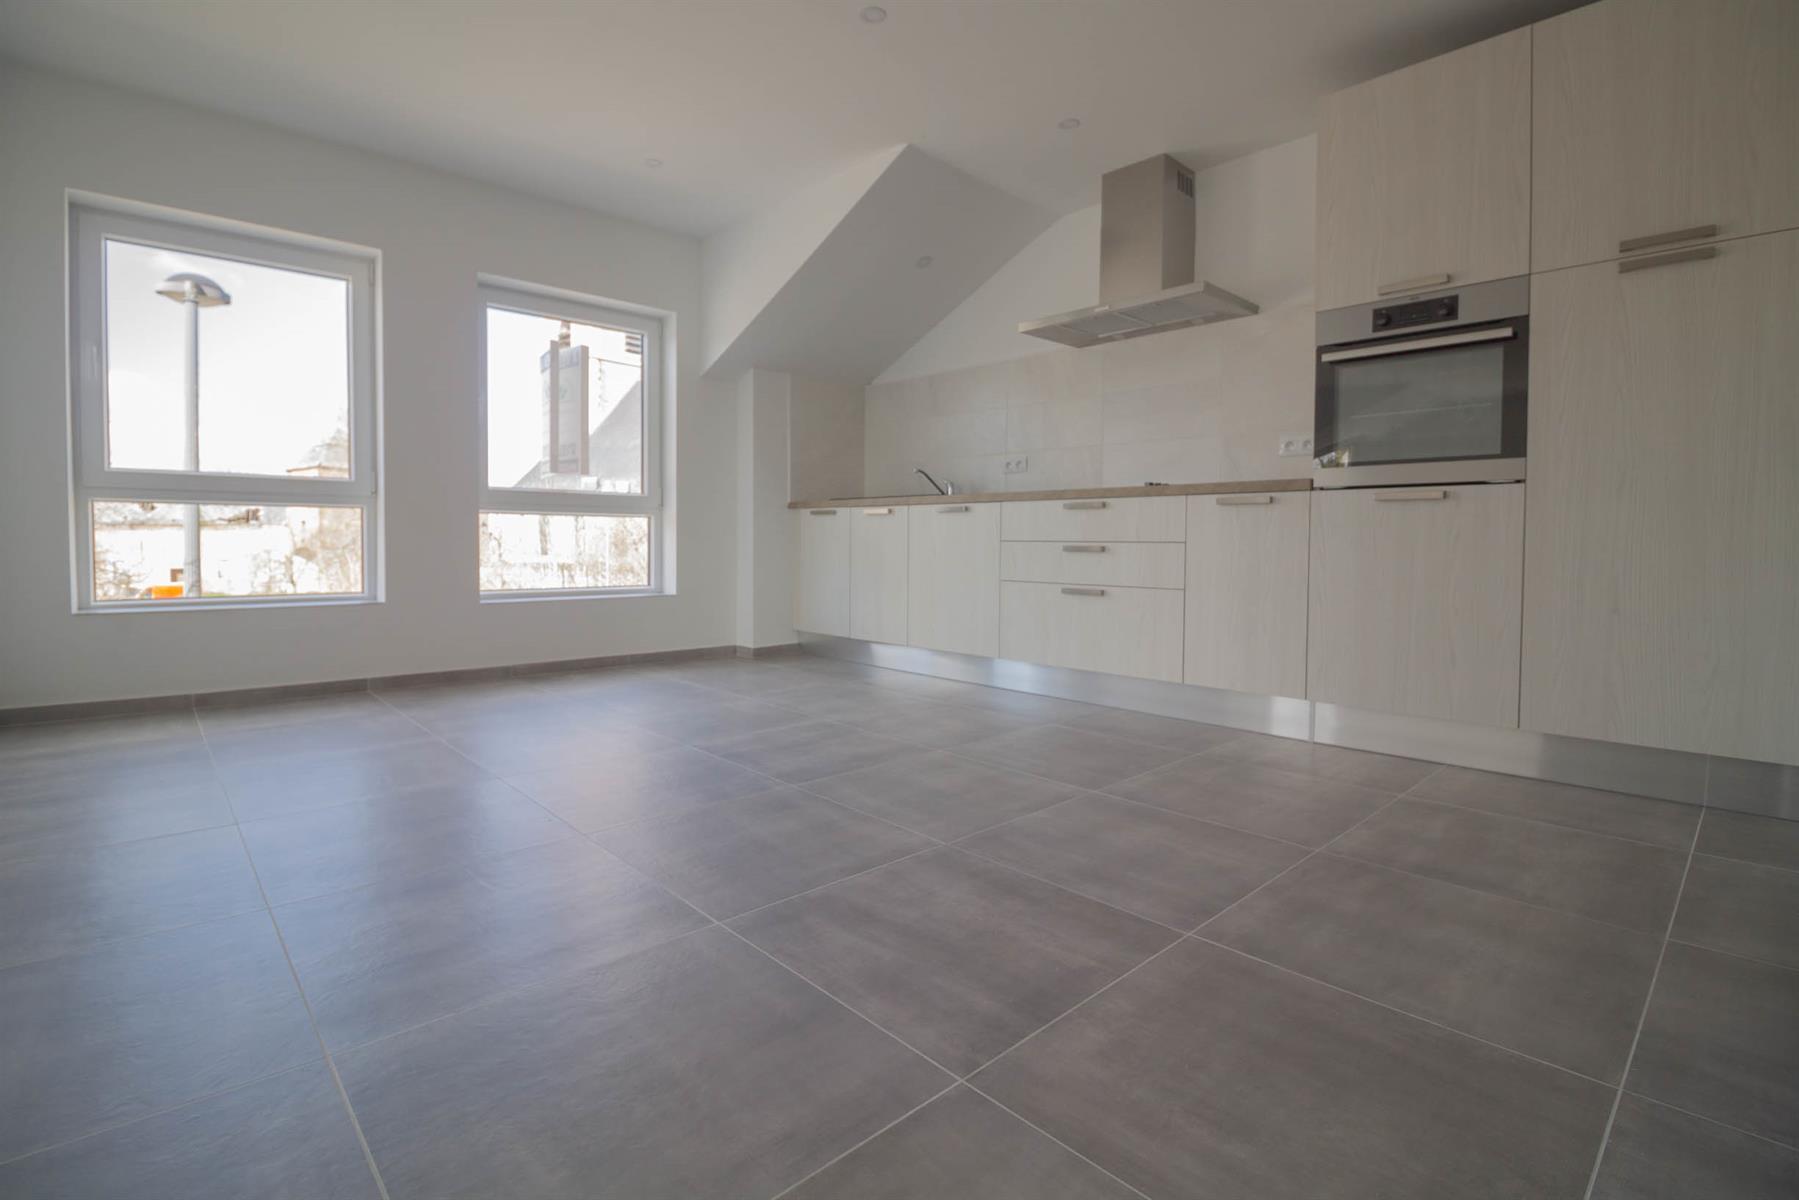 Appartement - Peissant - #4321179-6